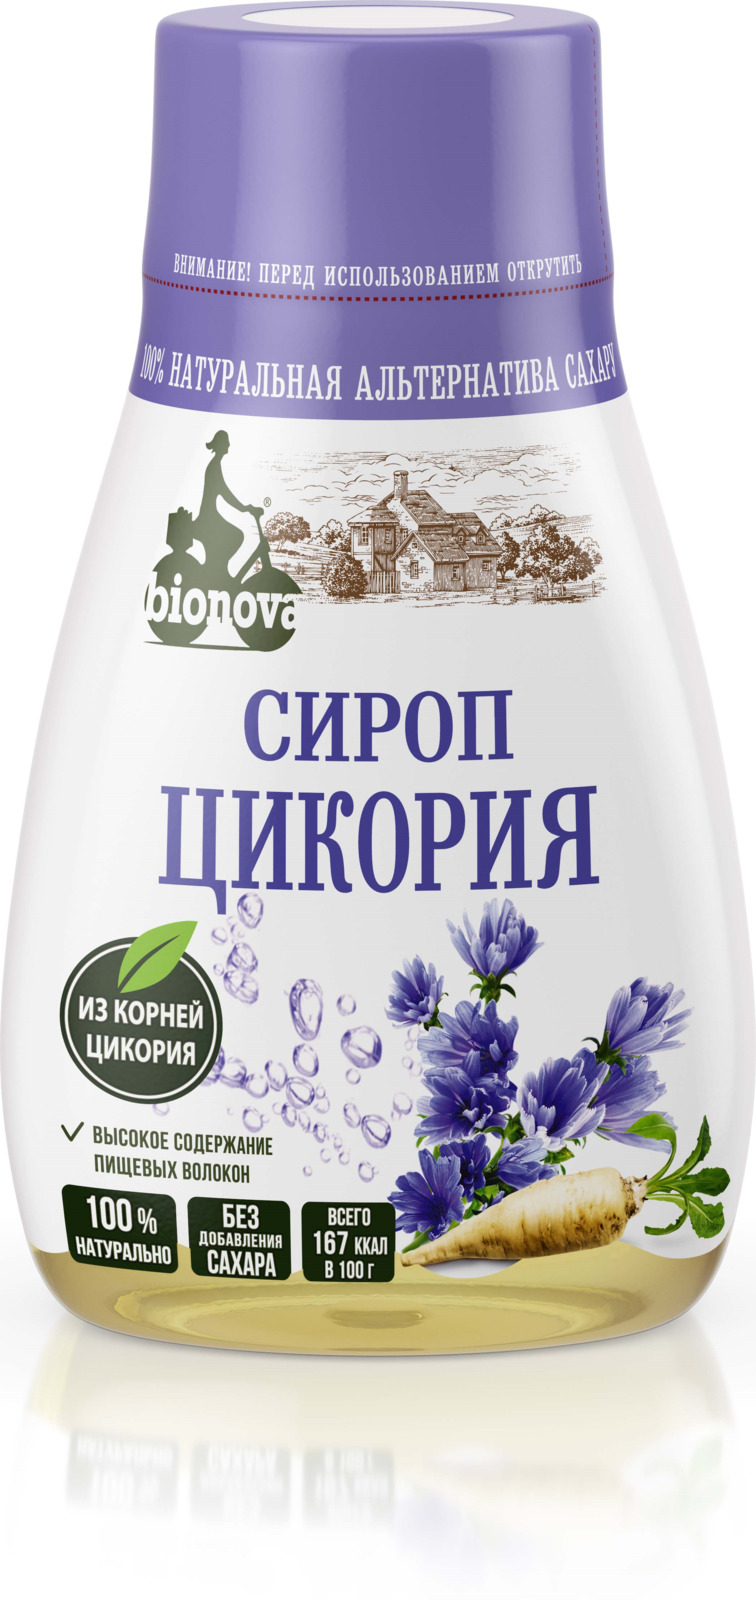 Сахарозаменитель Bionova Сироп цикория, 230 г недорого